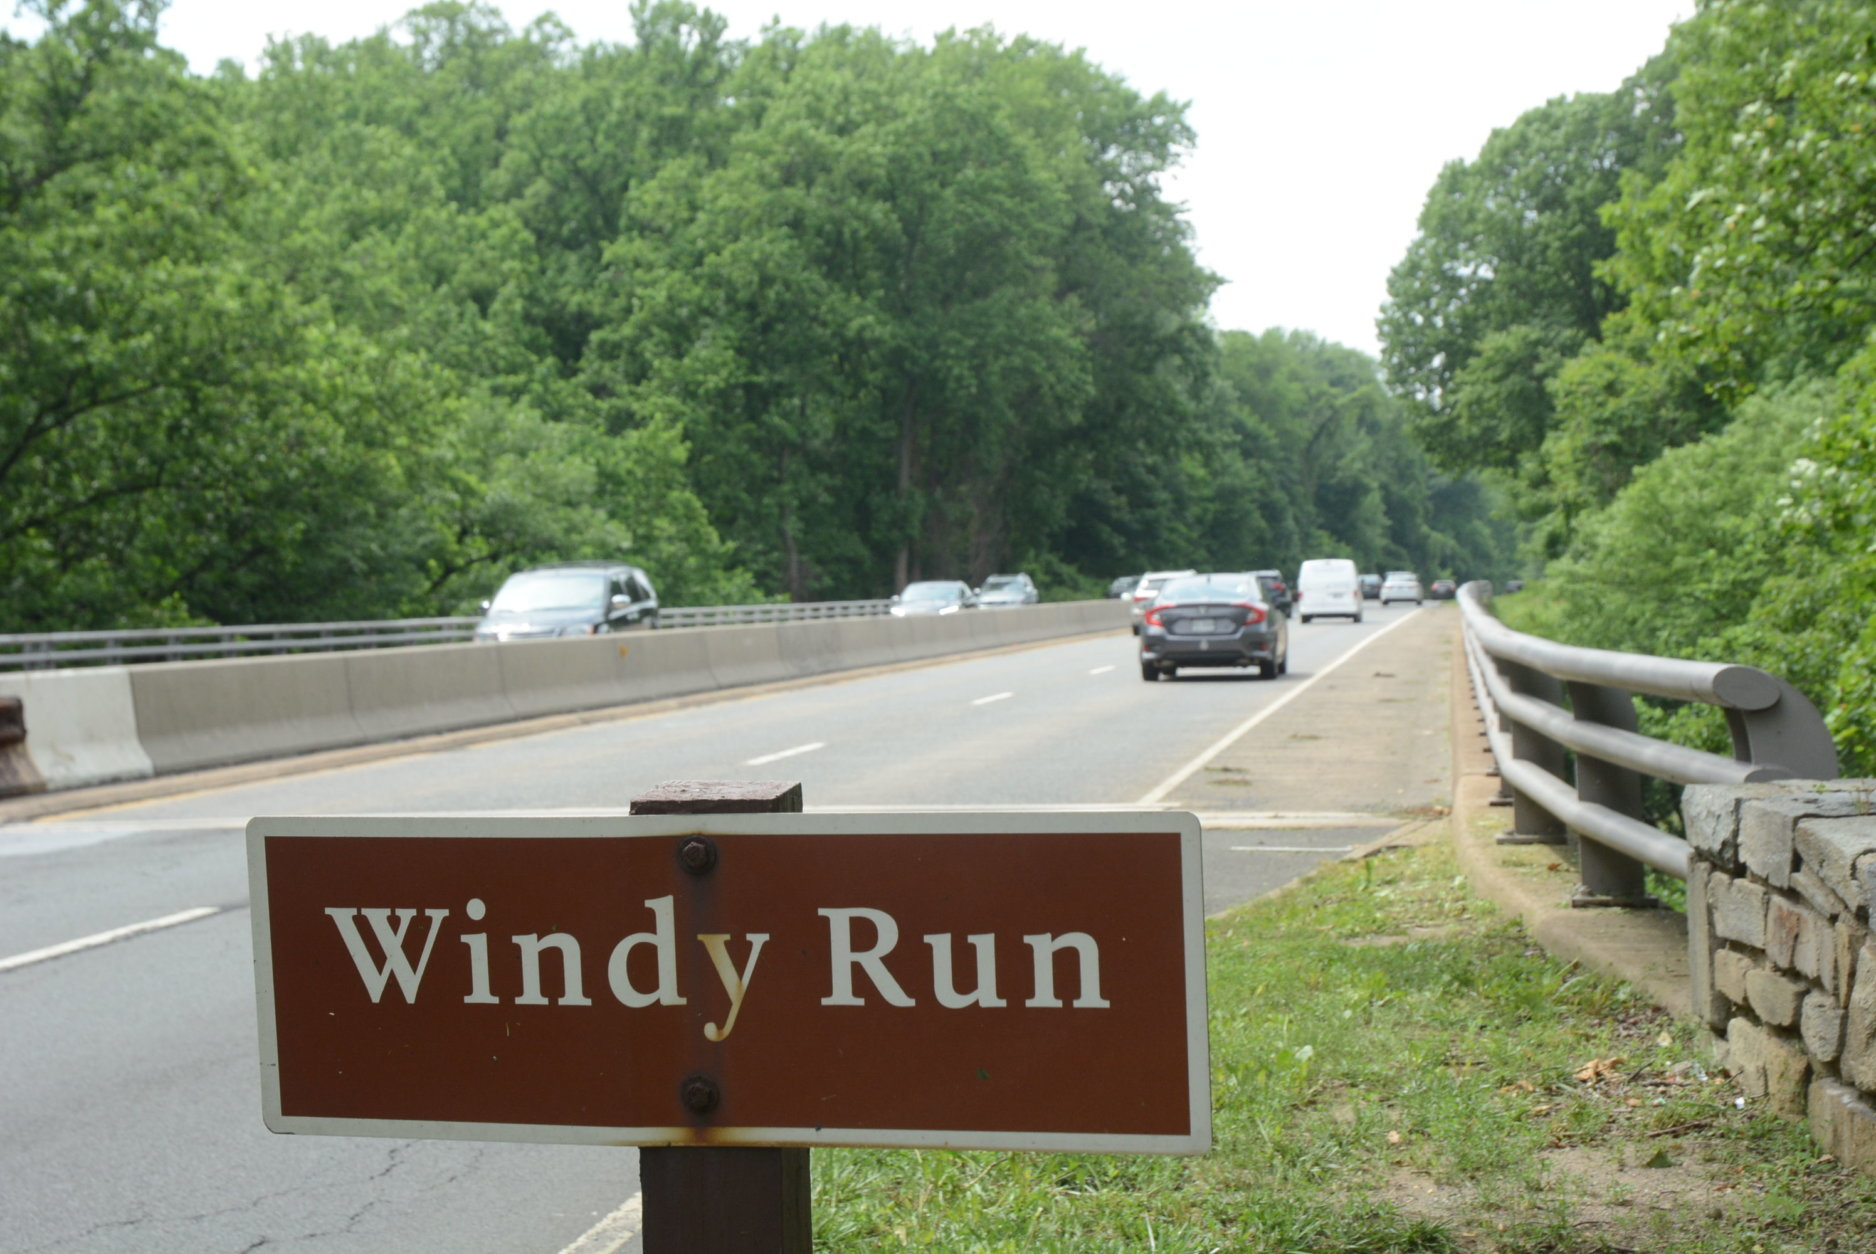 Windy Run GW Pkwy Dildine